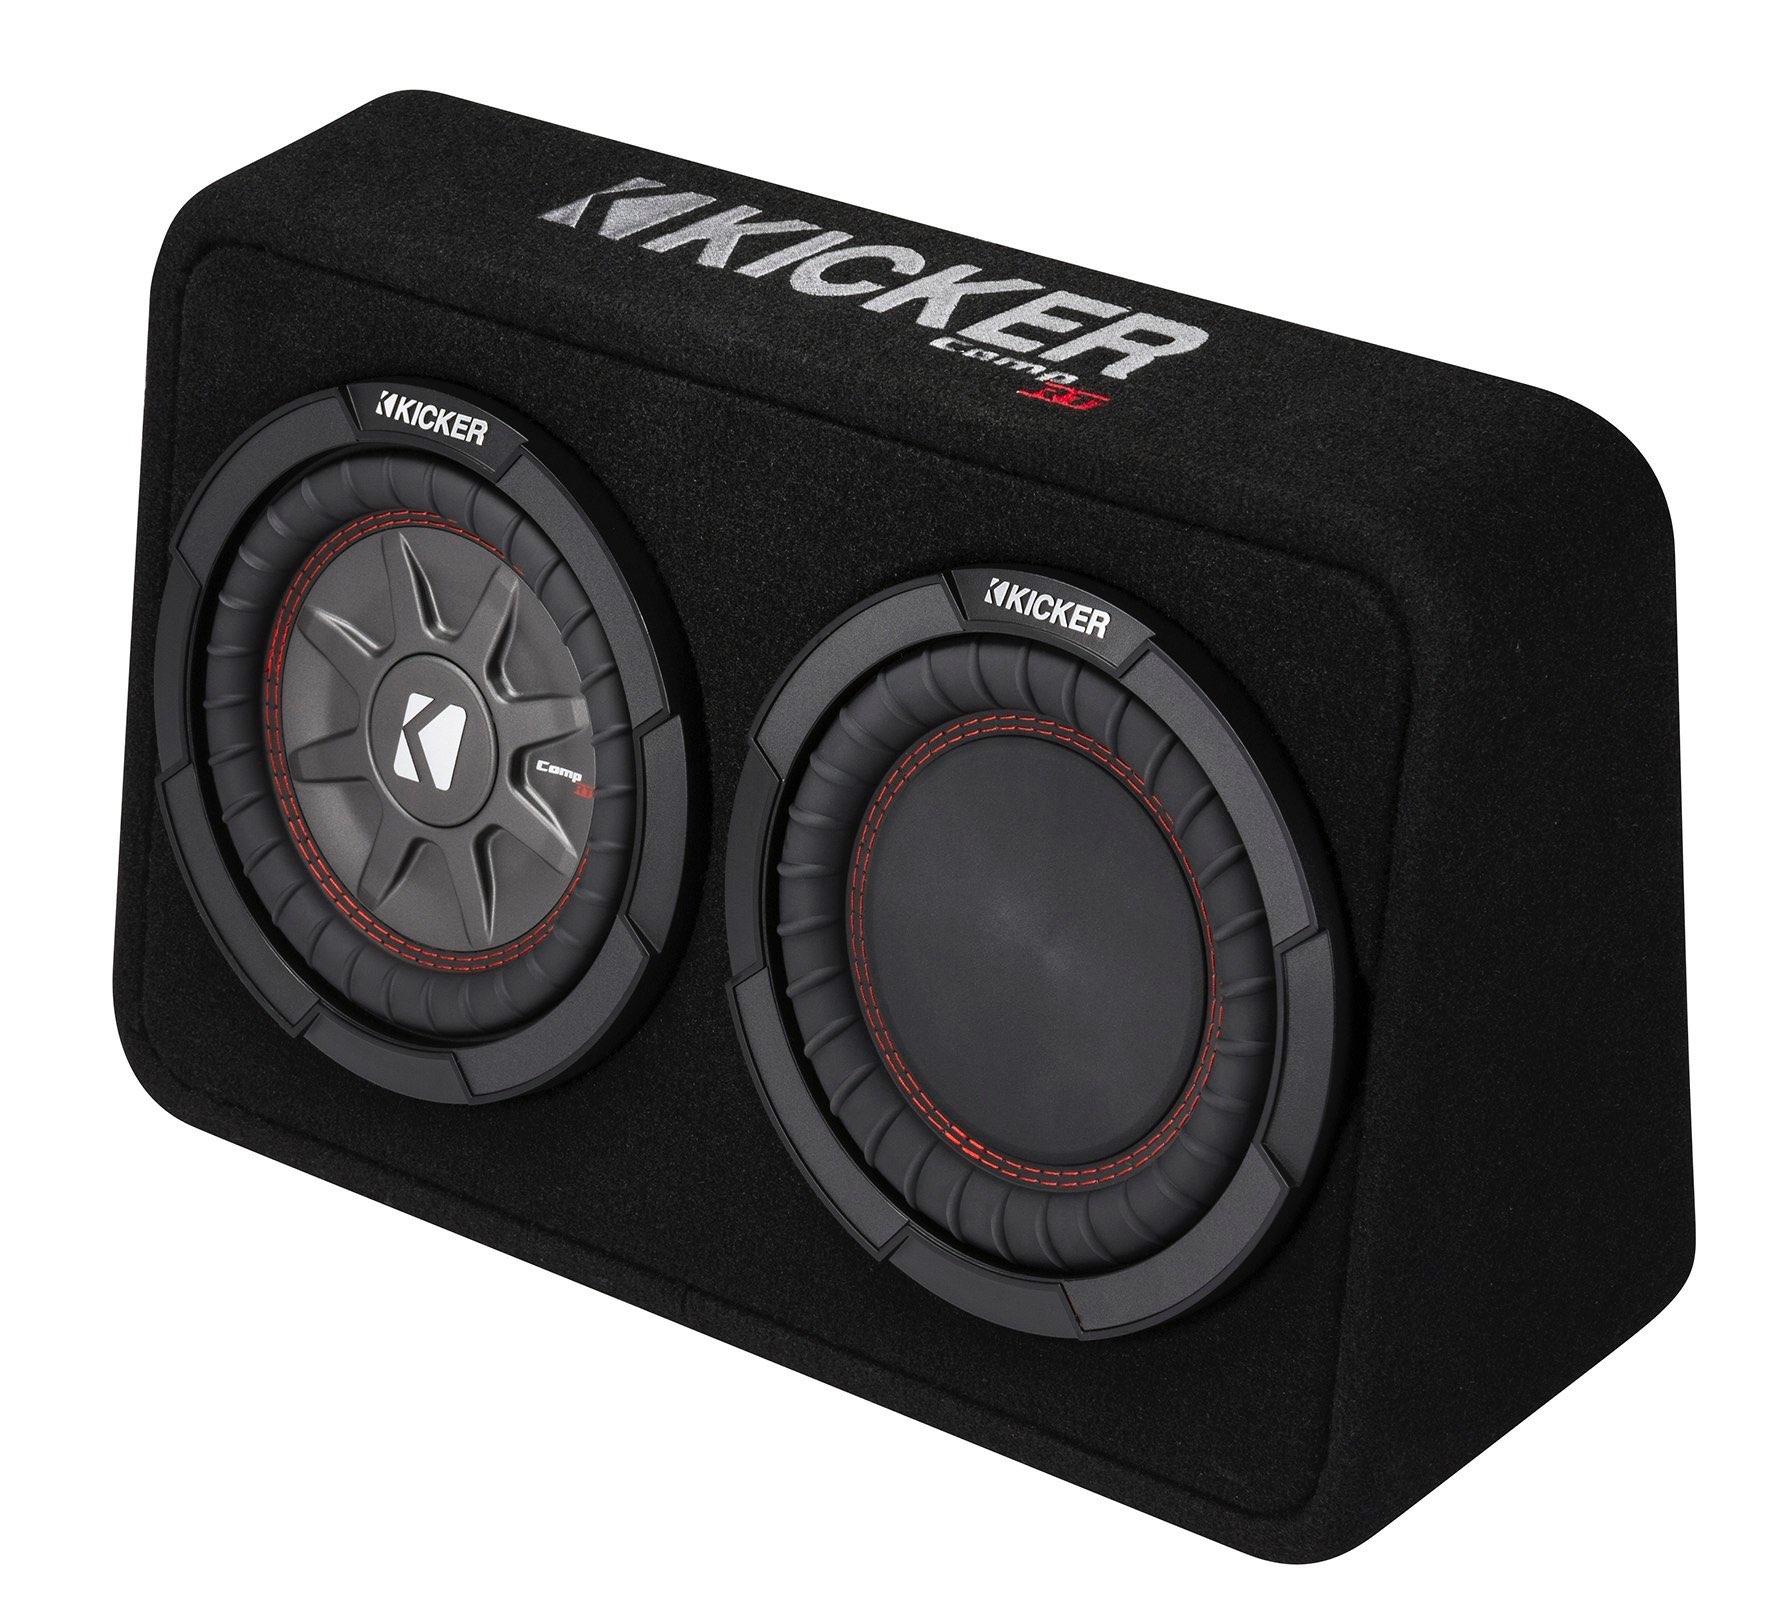 kicker subwoofer tcomp rt82 extra kleine bassbox 2ohm. Black Bedroom Furniture Sets. Home Design Ideas